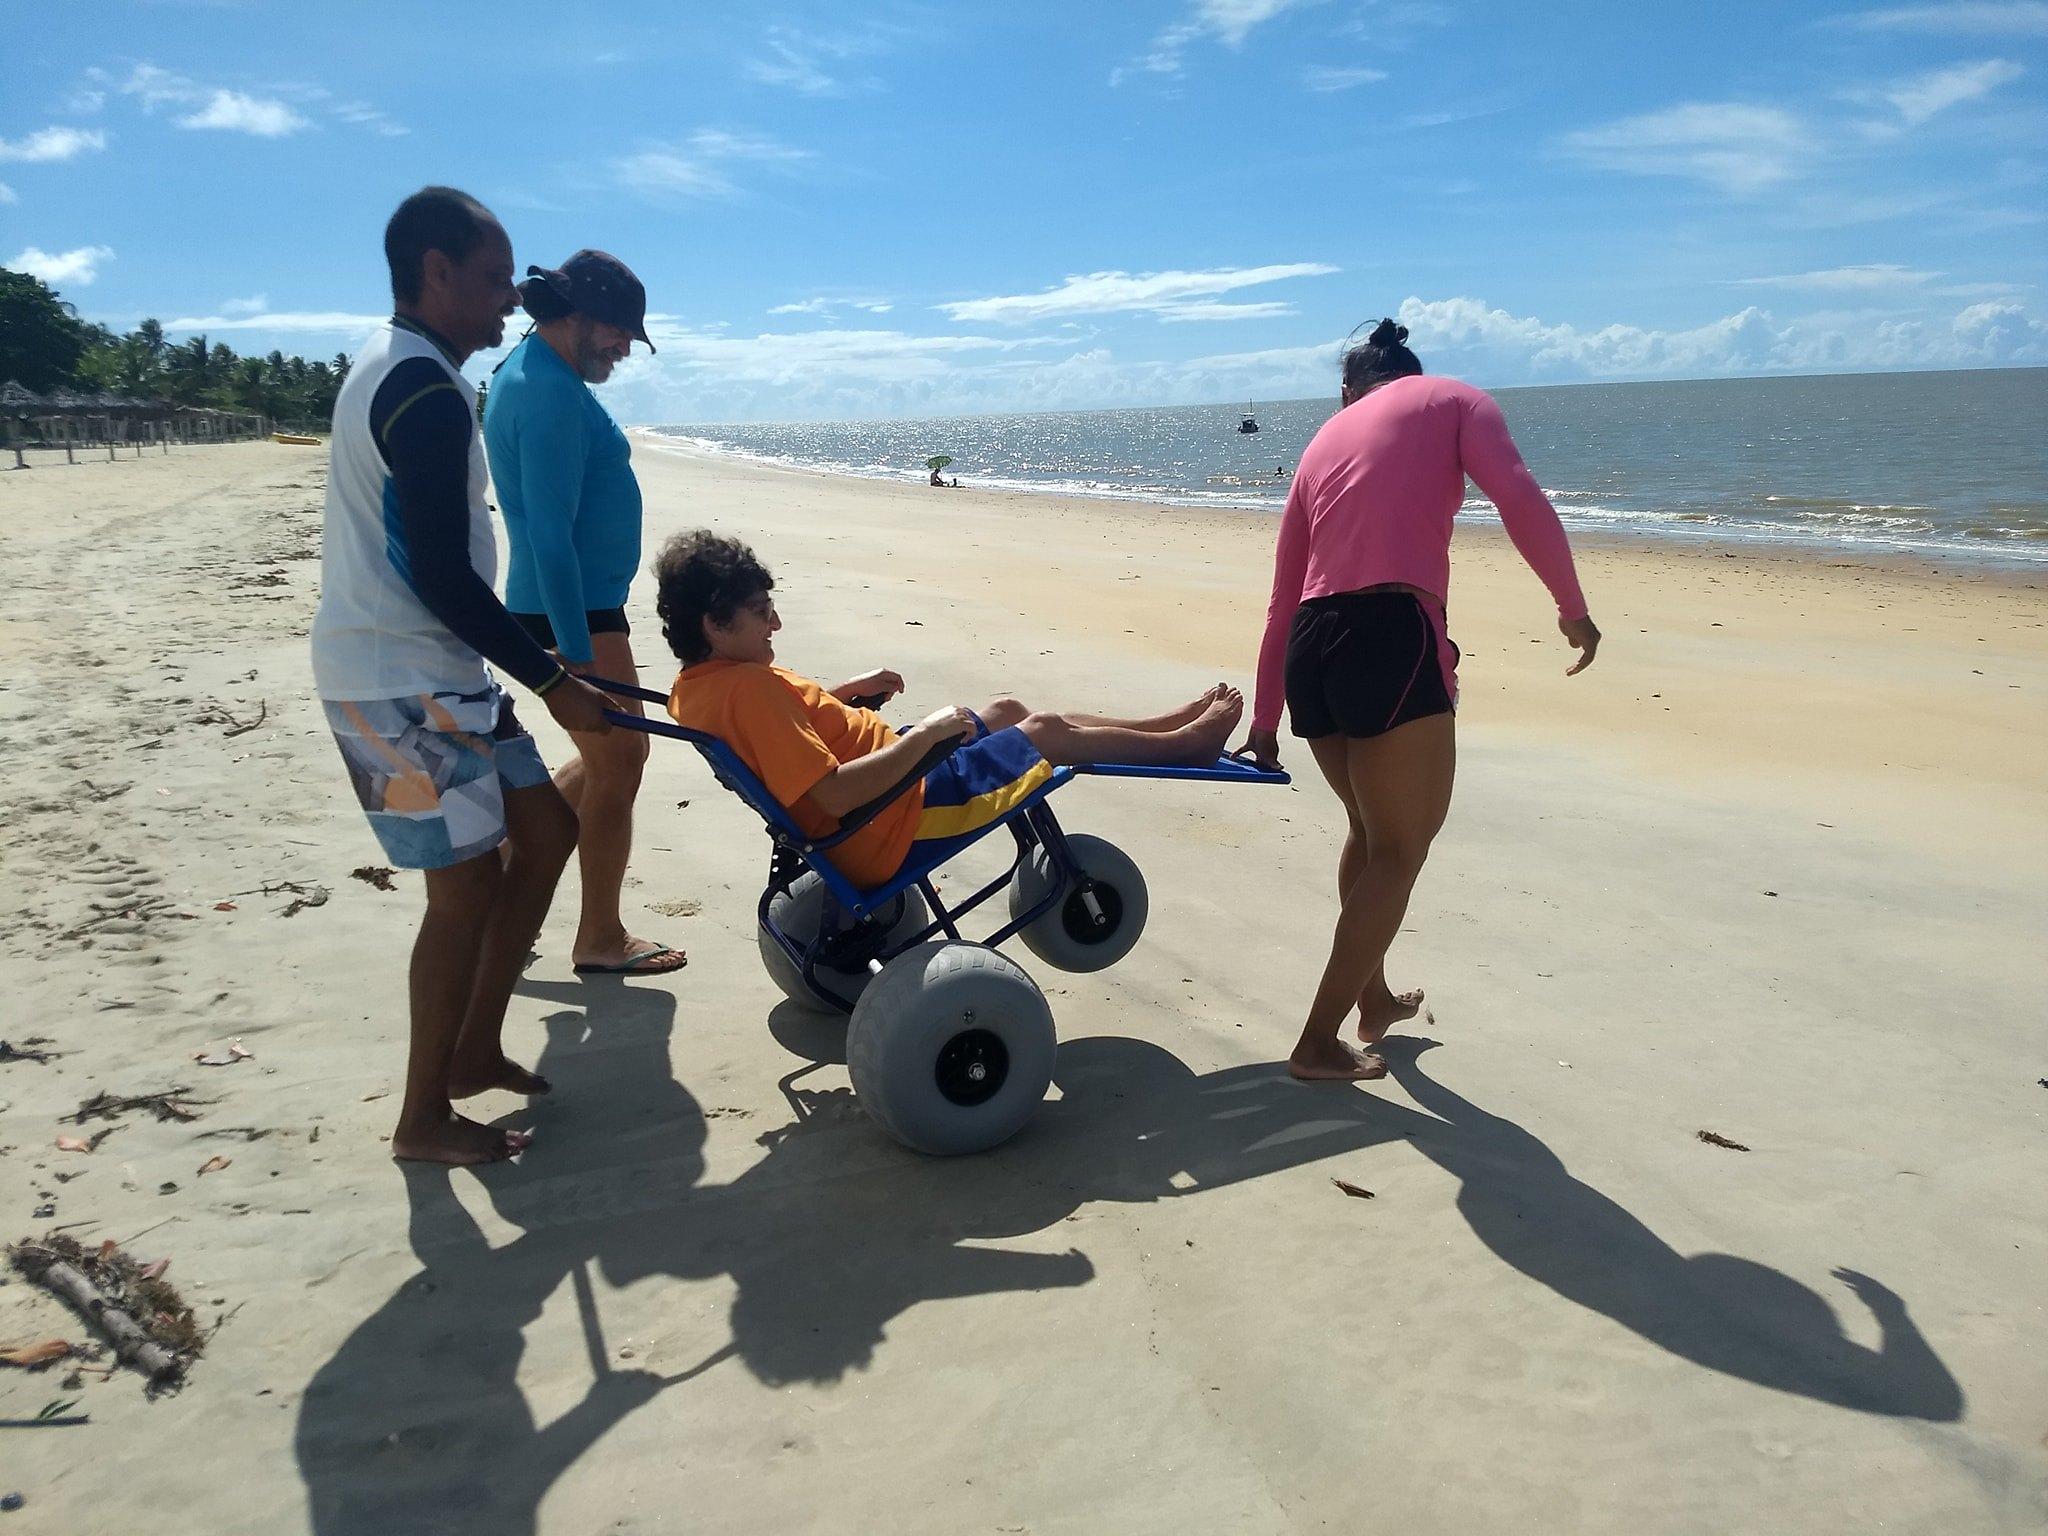 projeto praia para todos (5)